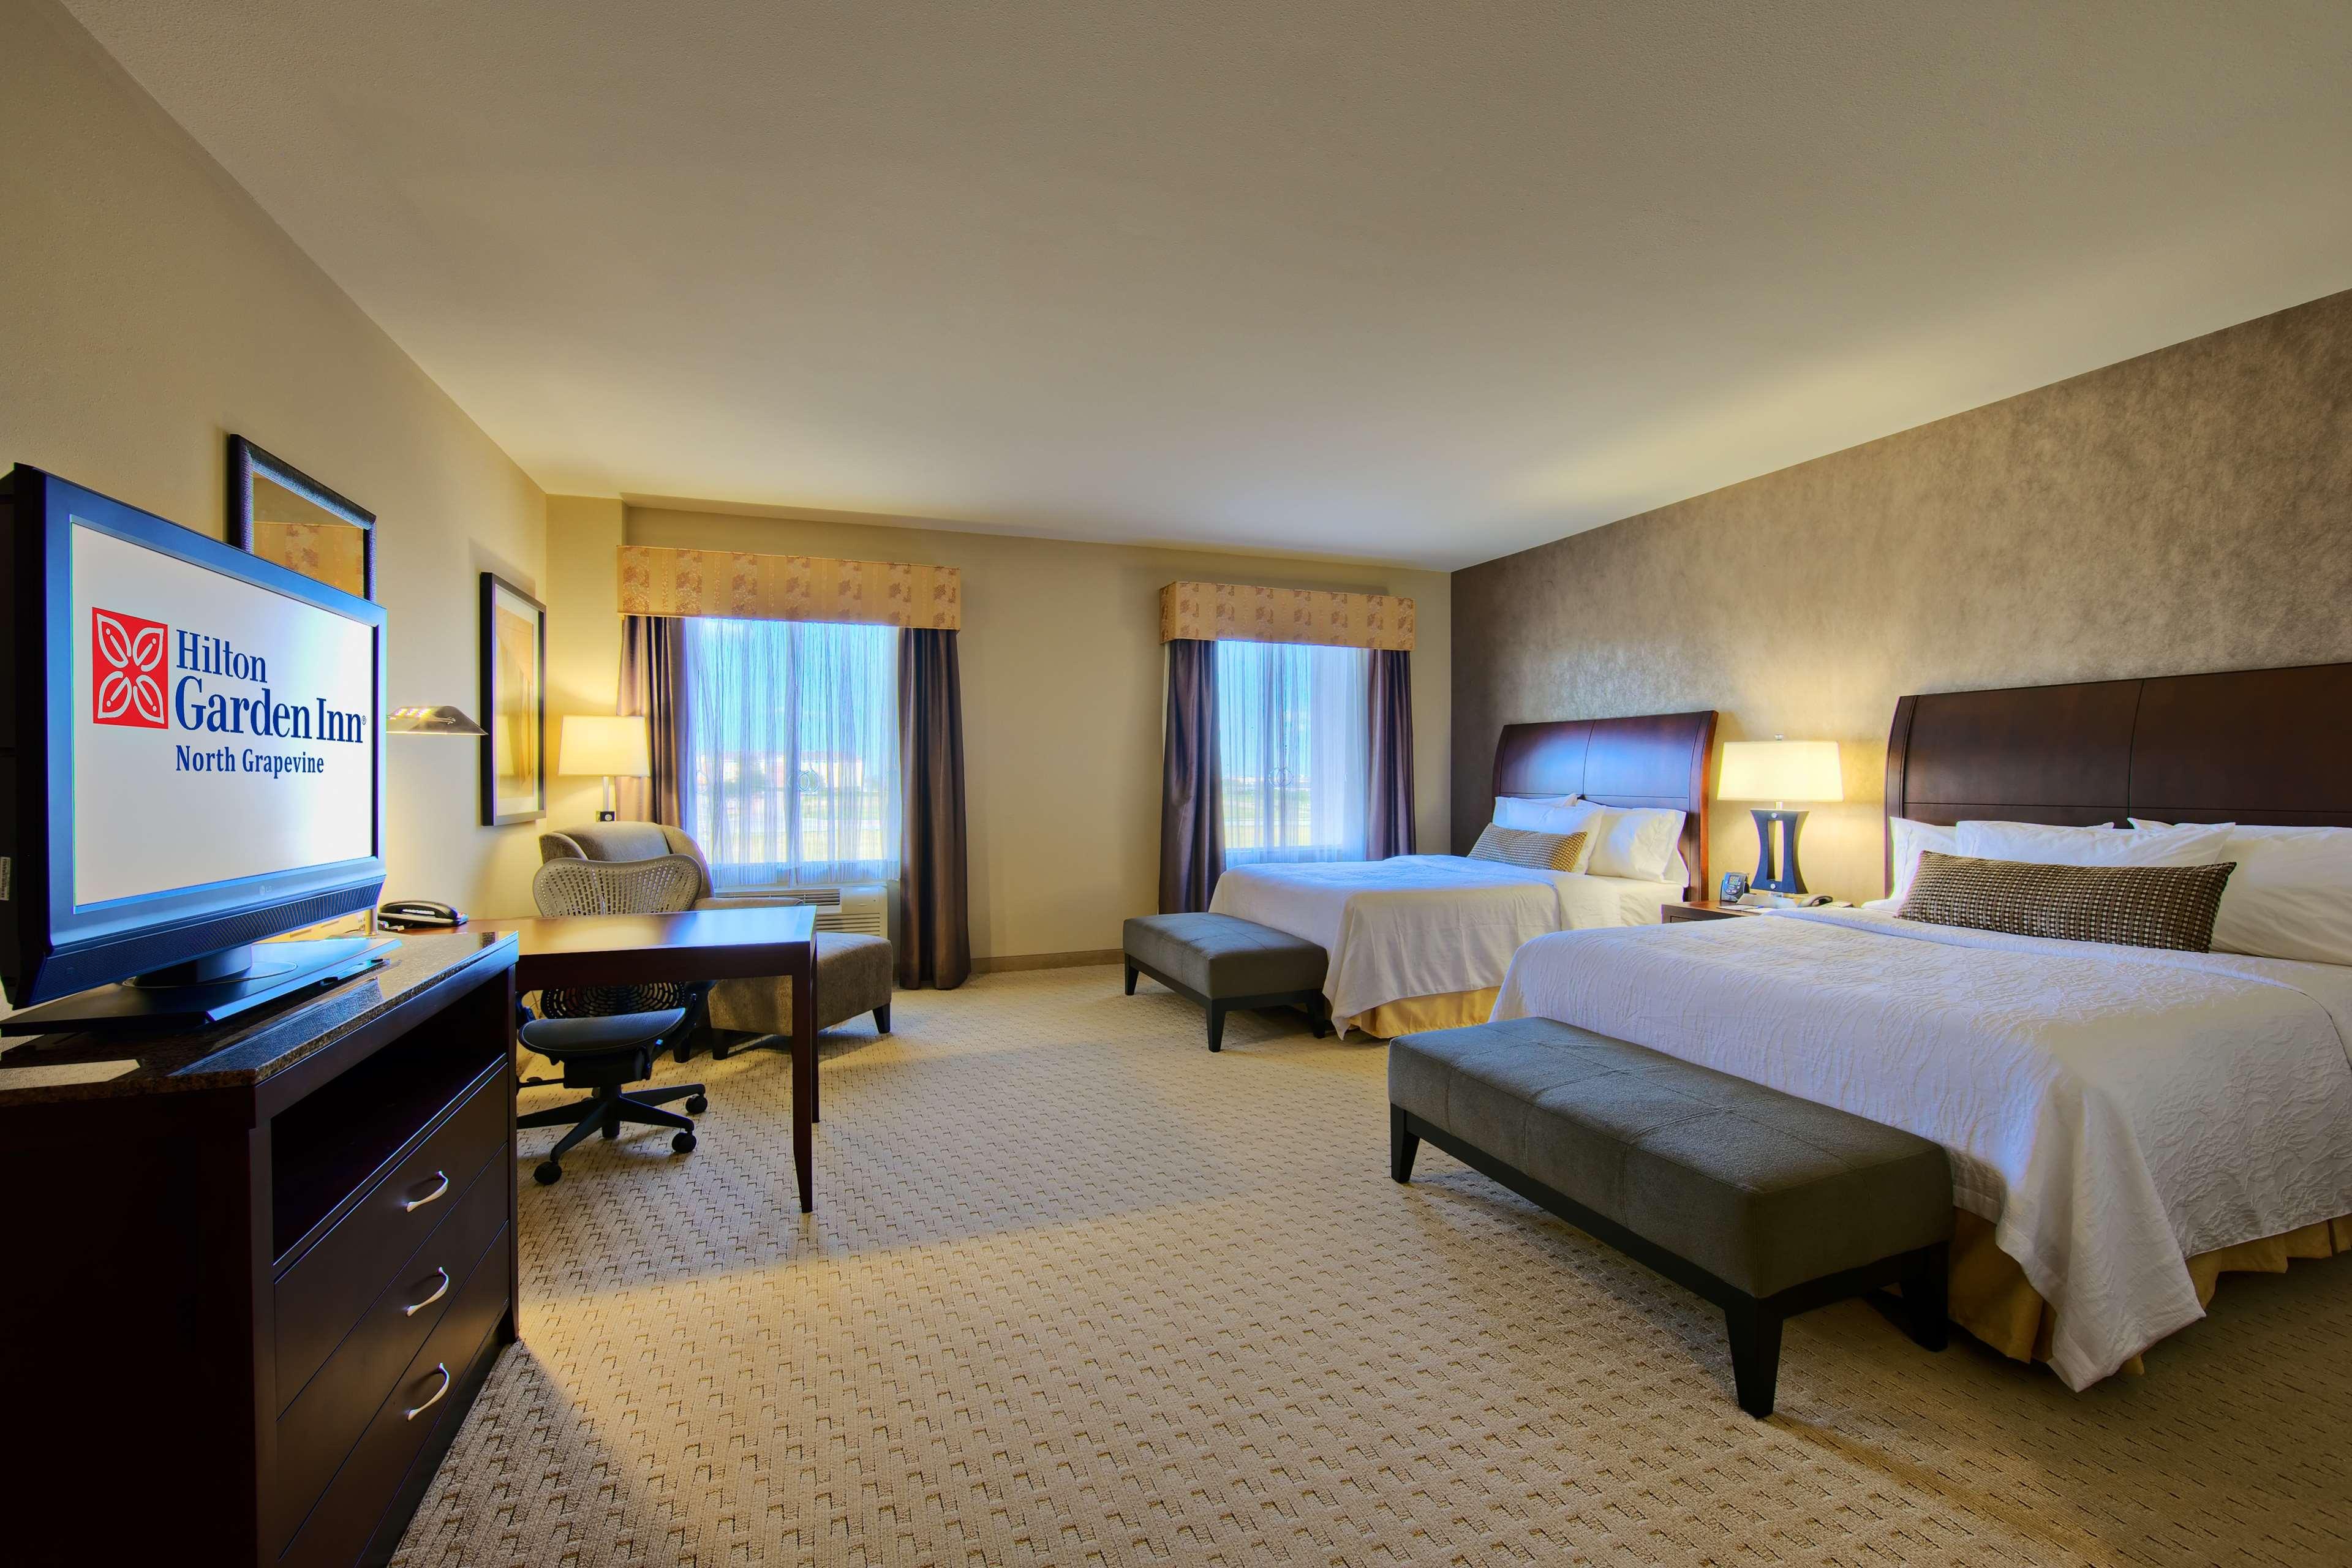 Hilton Garden Inn DFW North Grapevine image 23